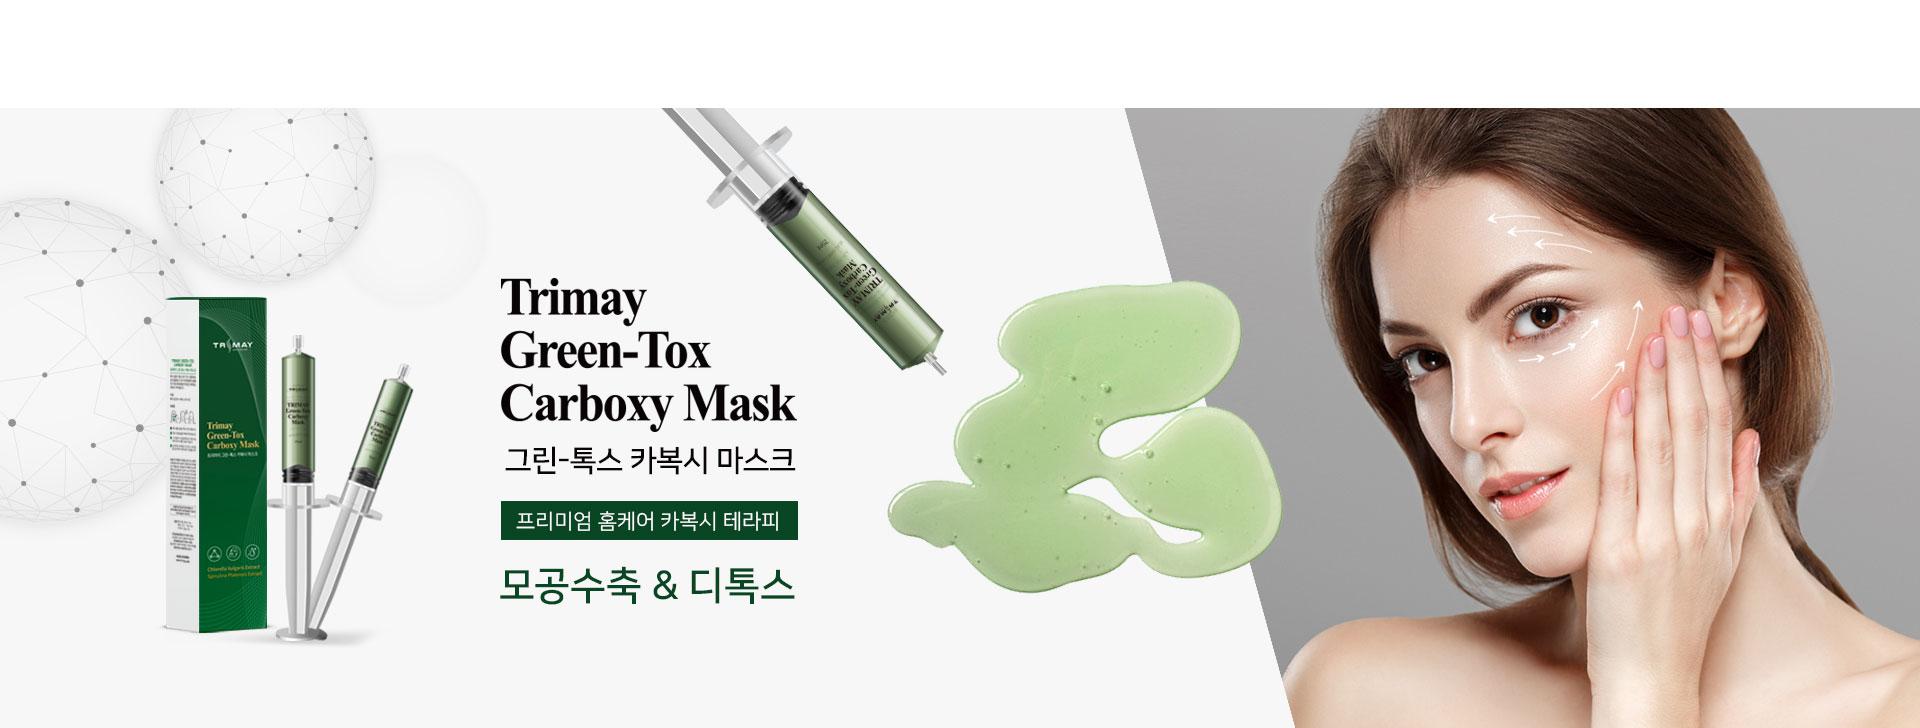 [Trimay] Омолаживающая детокс-маска для карбокситерапии, Carboxy CO2 Clinik Mask, 25 мл.